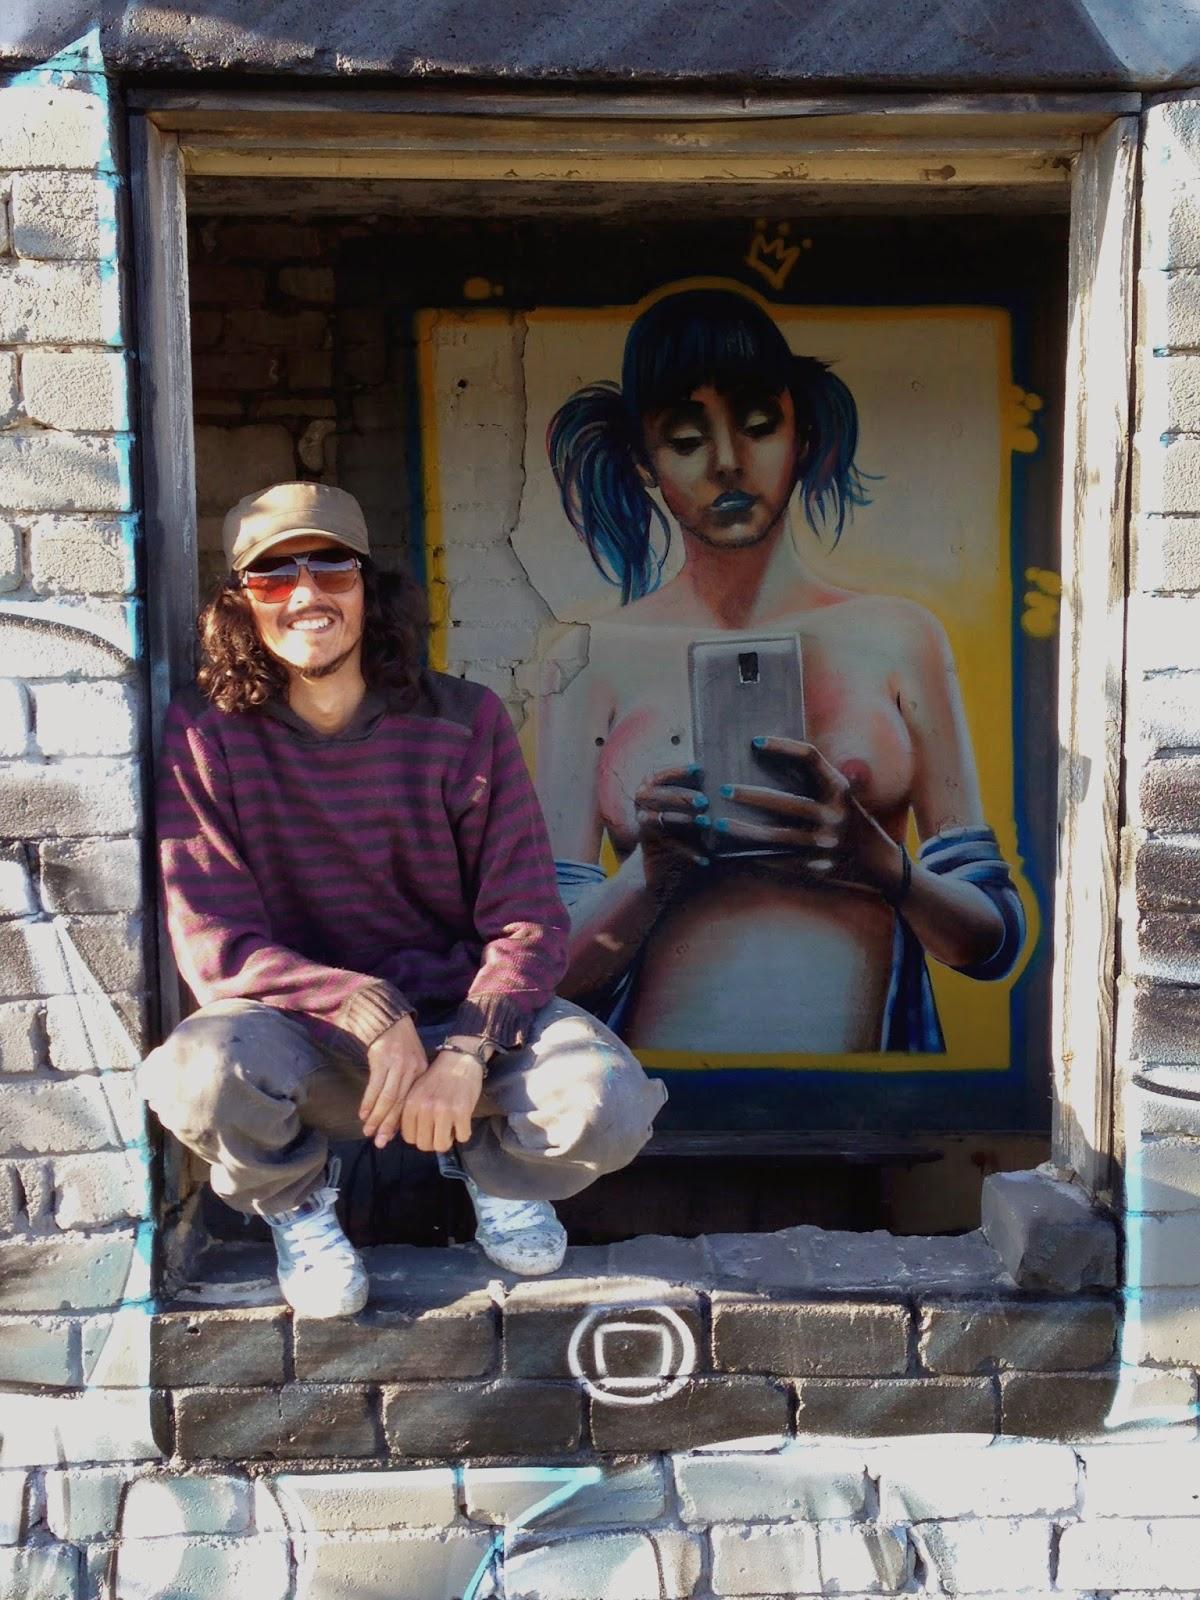 street art, street art estonia, street art chile, sketch, graffiti, mural, like or die, izak, izak one